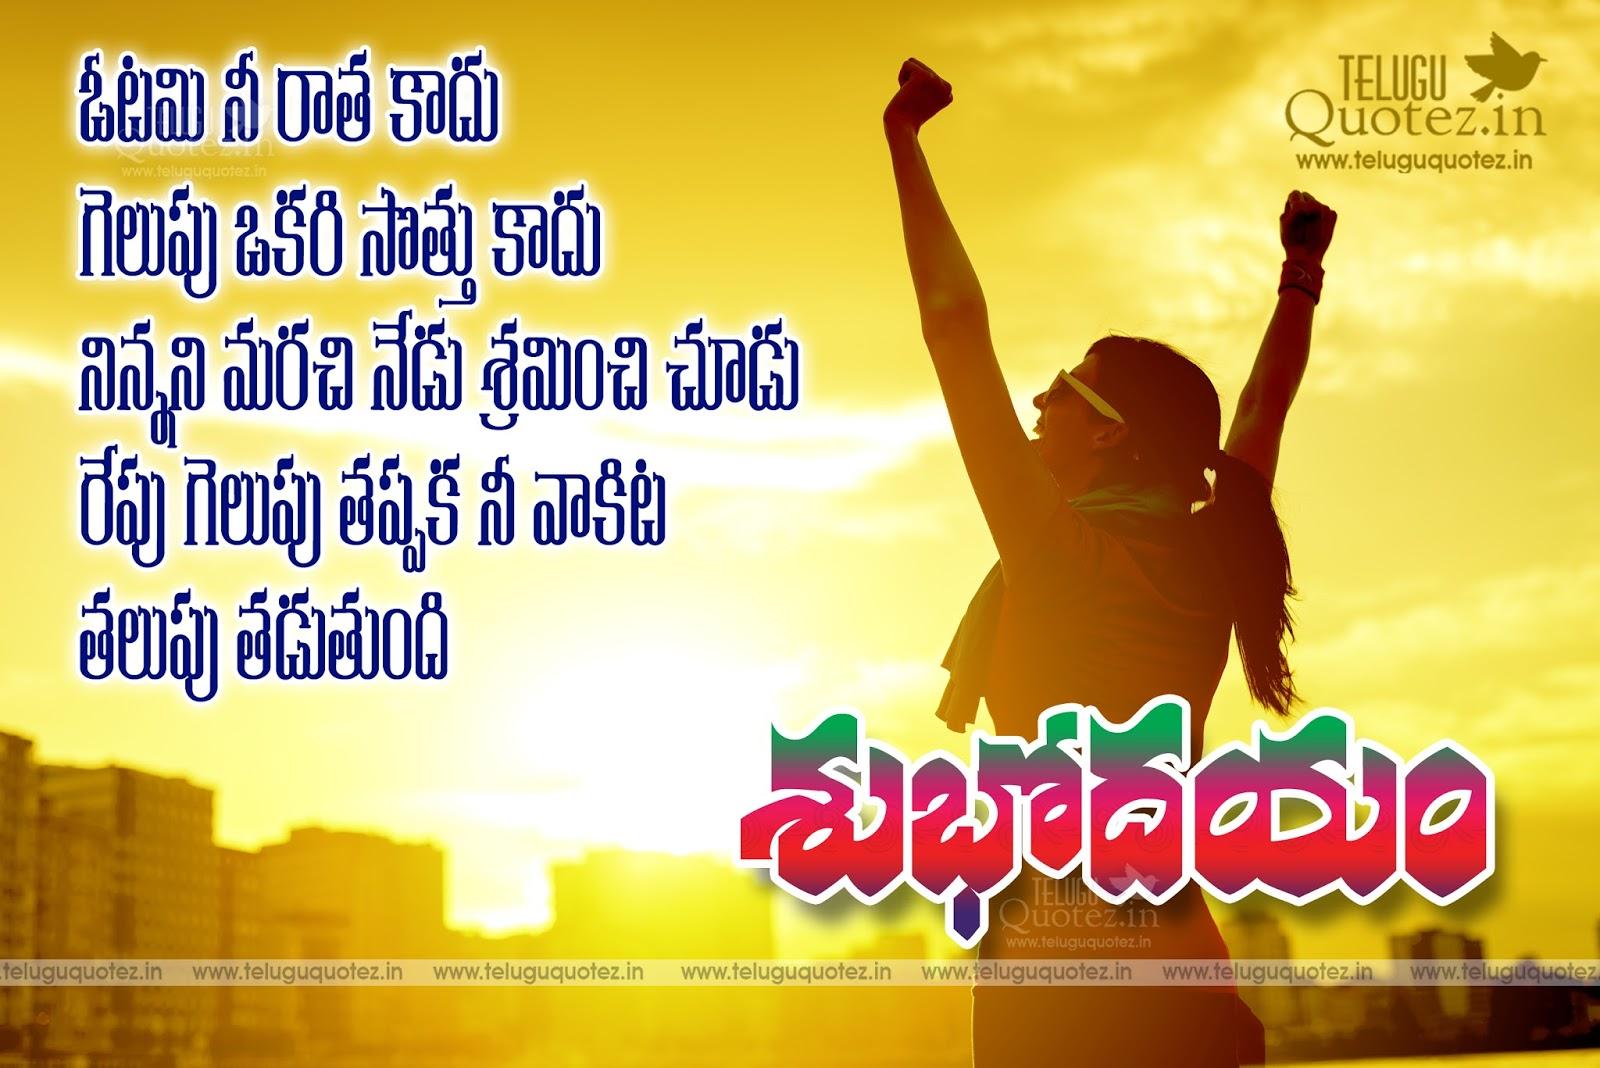 Morning Life Quotes Best Positive Good Morning Telugu Quotes About Life  Teluguquotez